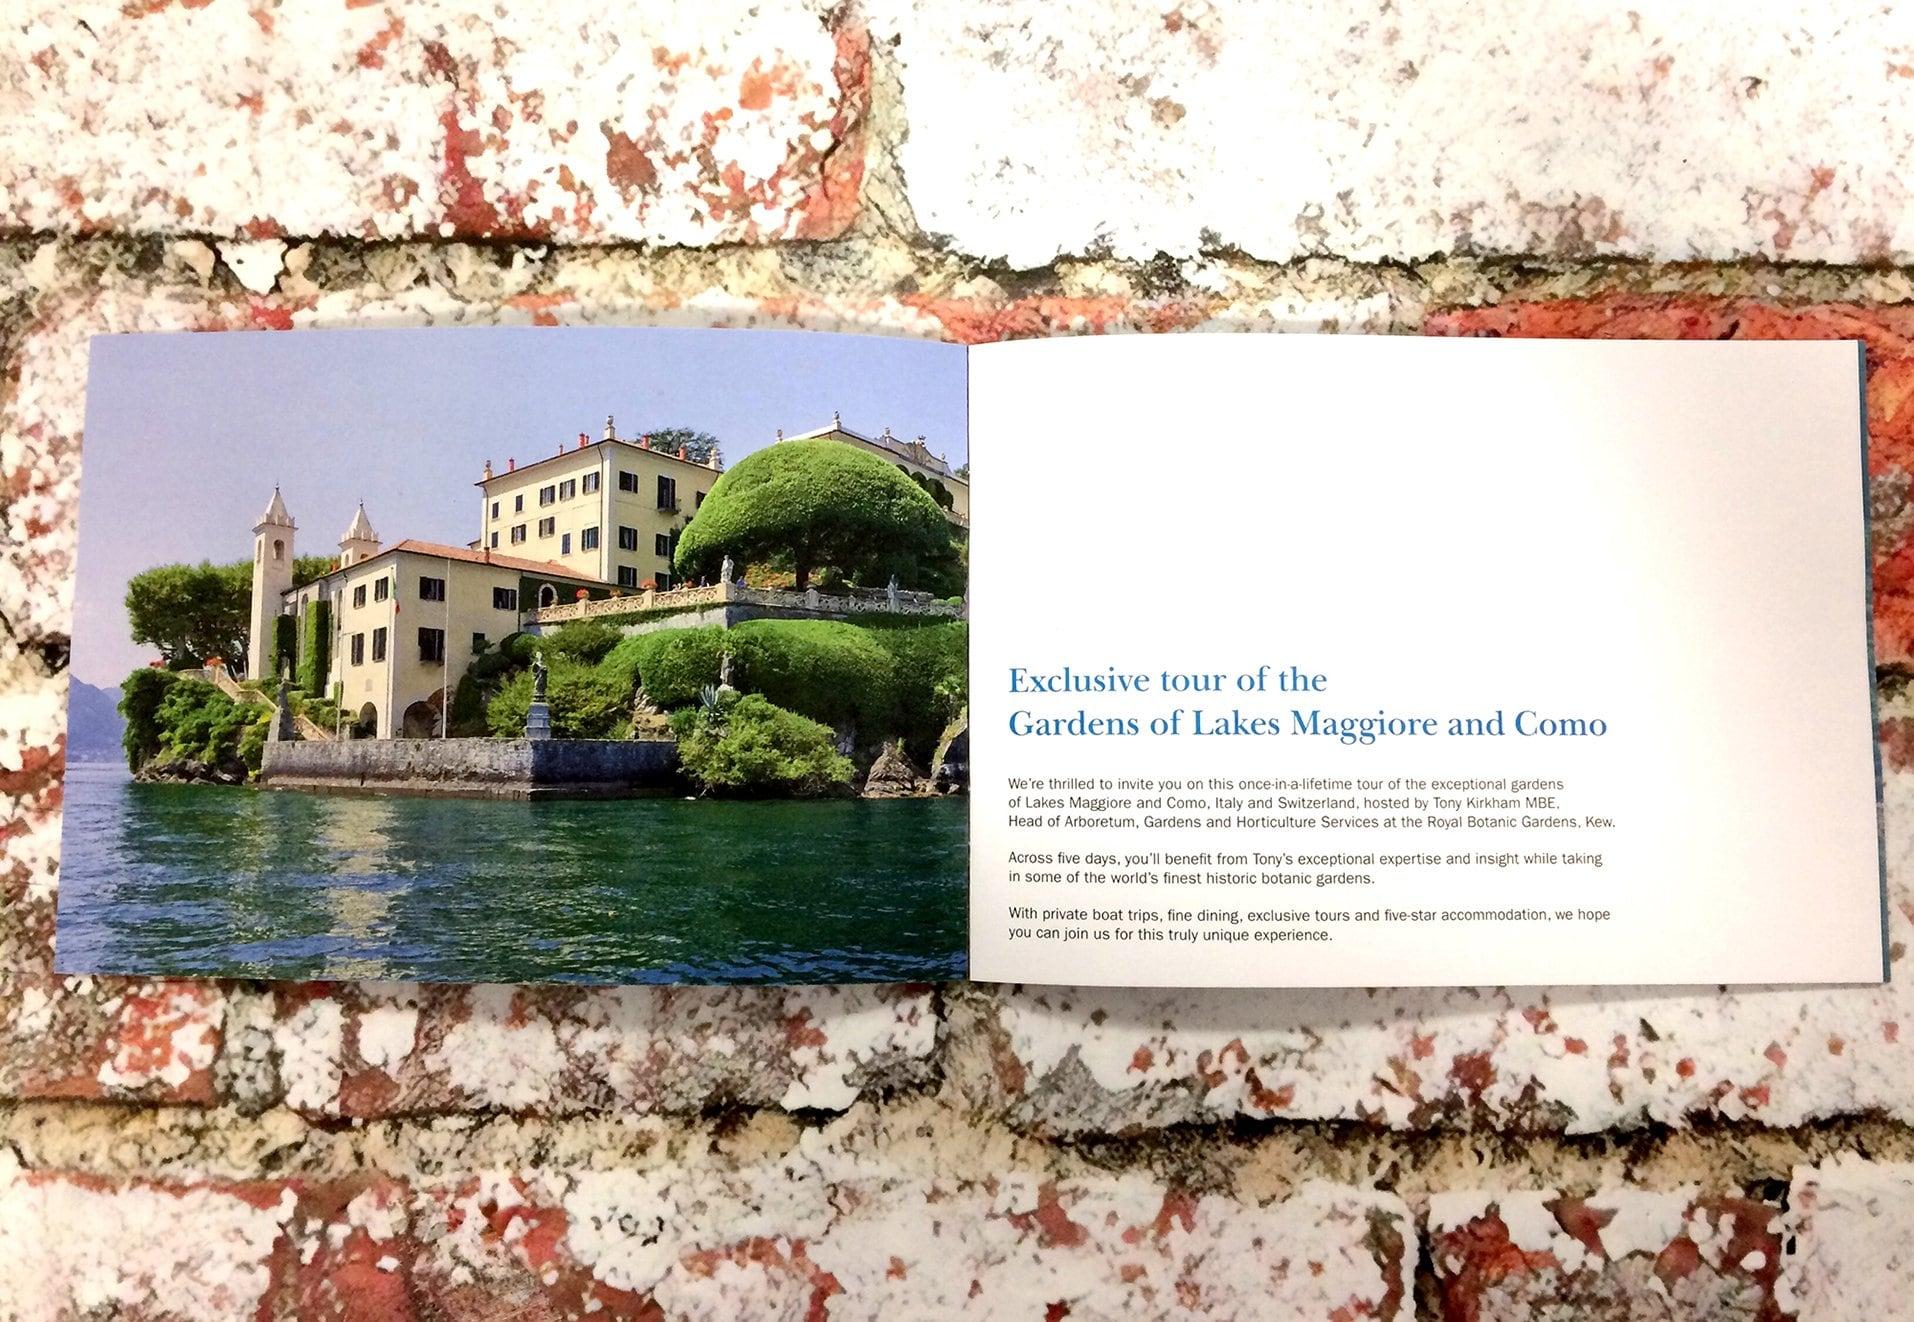 Kew Italy Trip Printed Material Spread